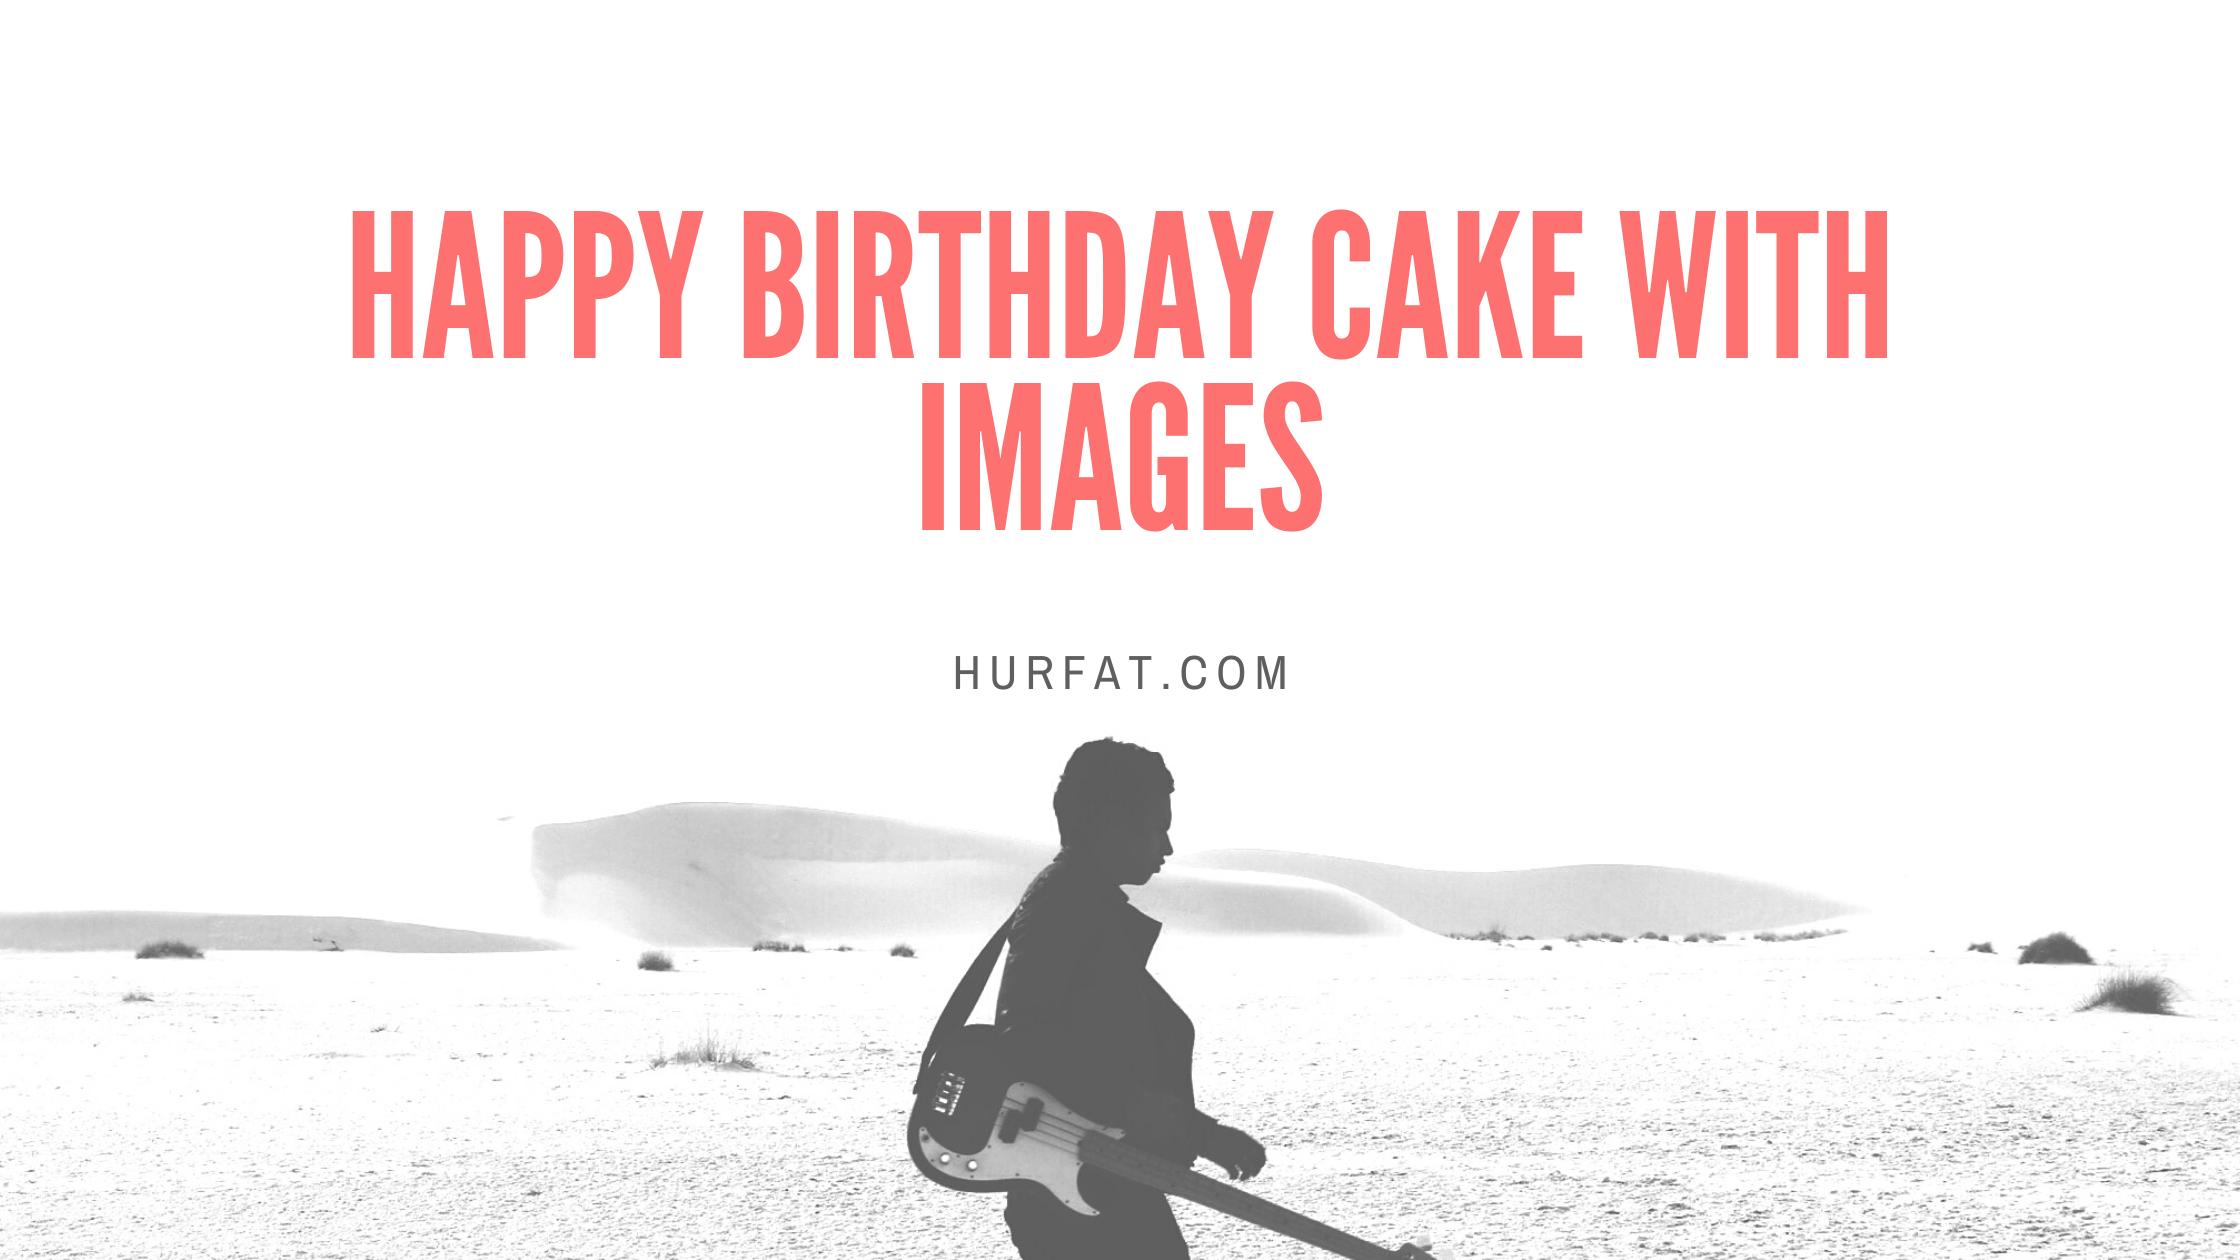 Happy Birthday Cake With Images